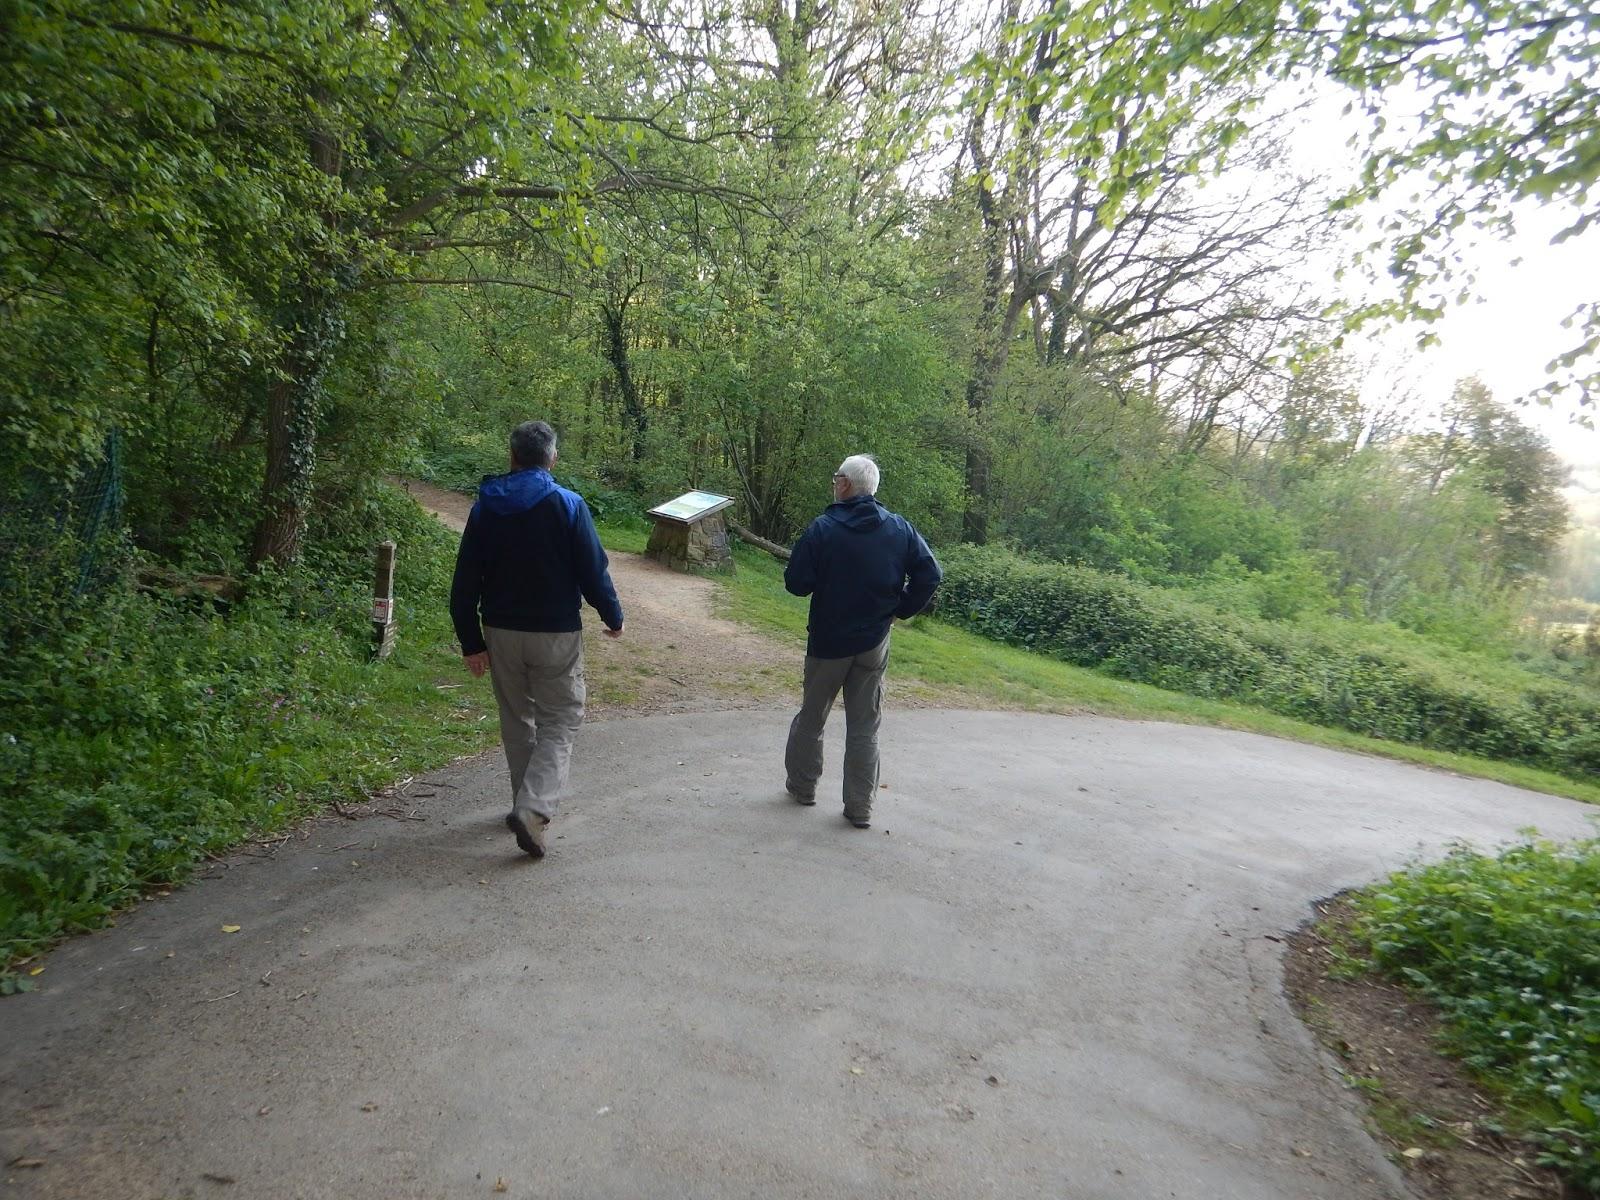 Rando Wardrecques: Monts de Flandre Parc Marguerite Yourcenar